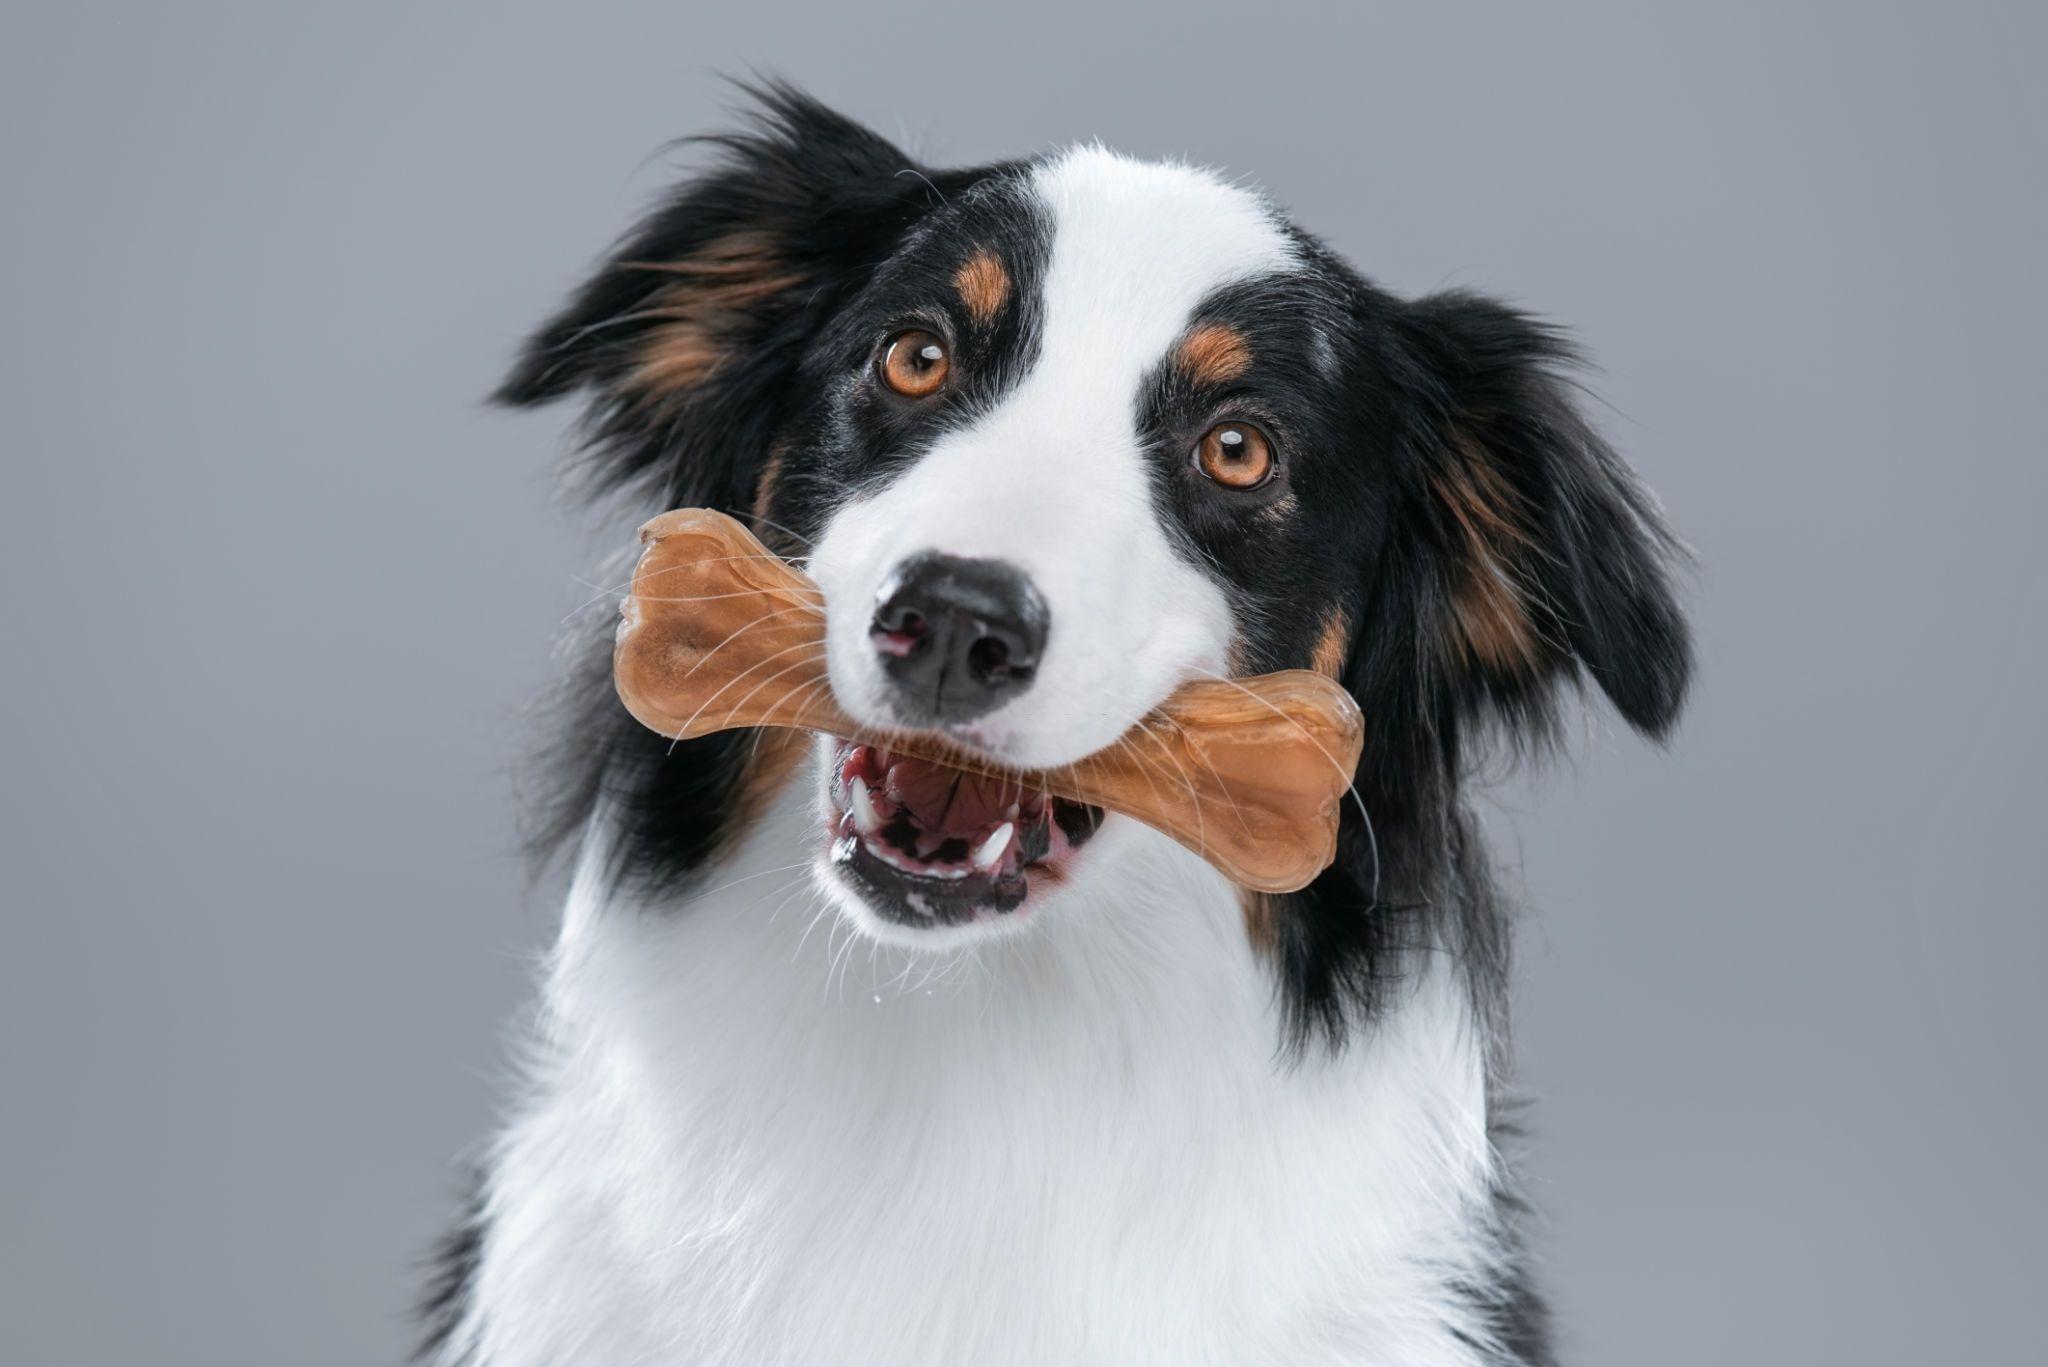 Australian Shepherd dog with chew bone